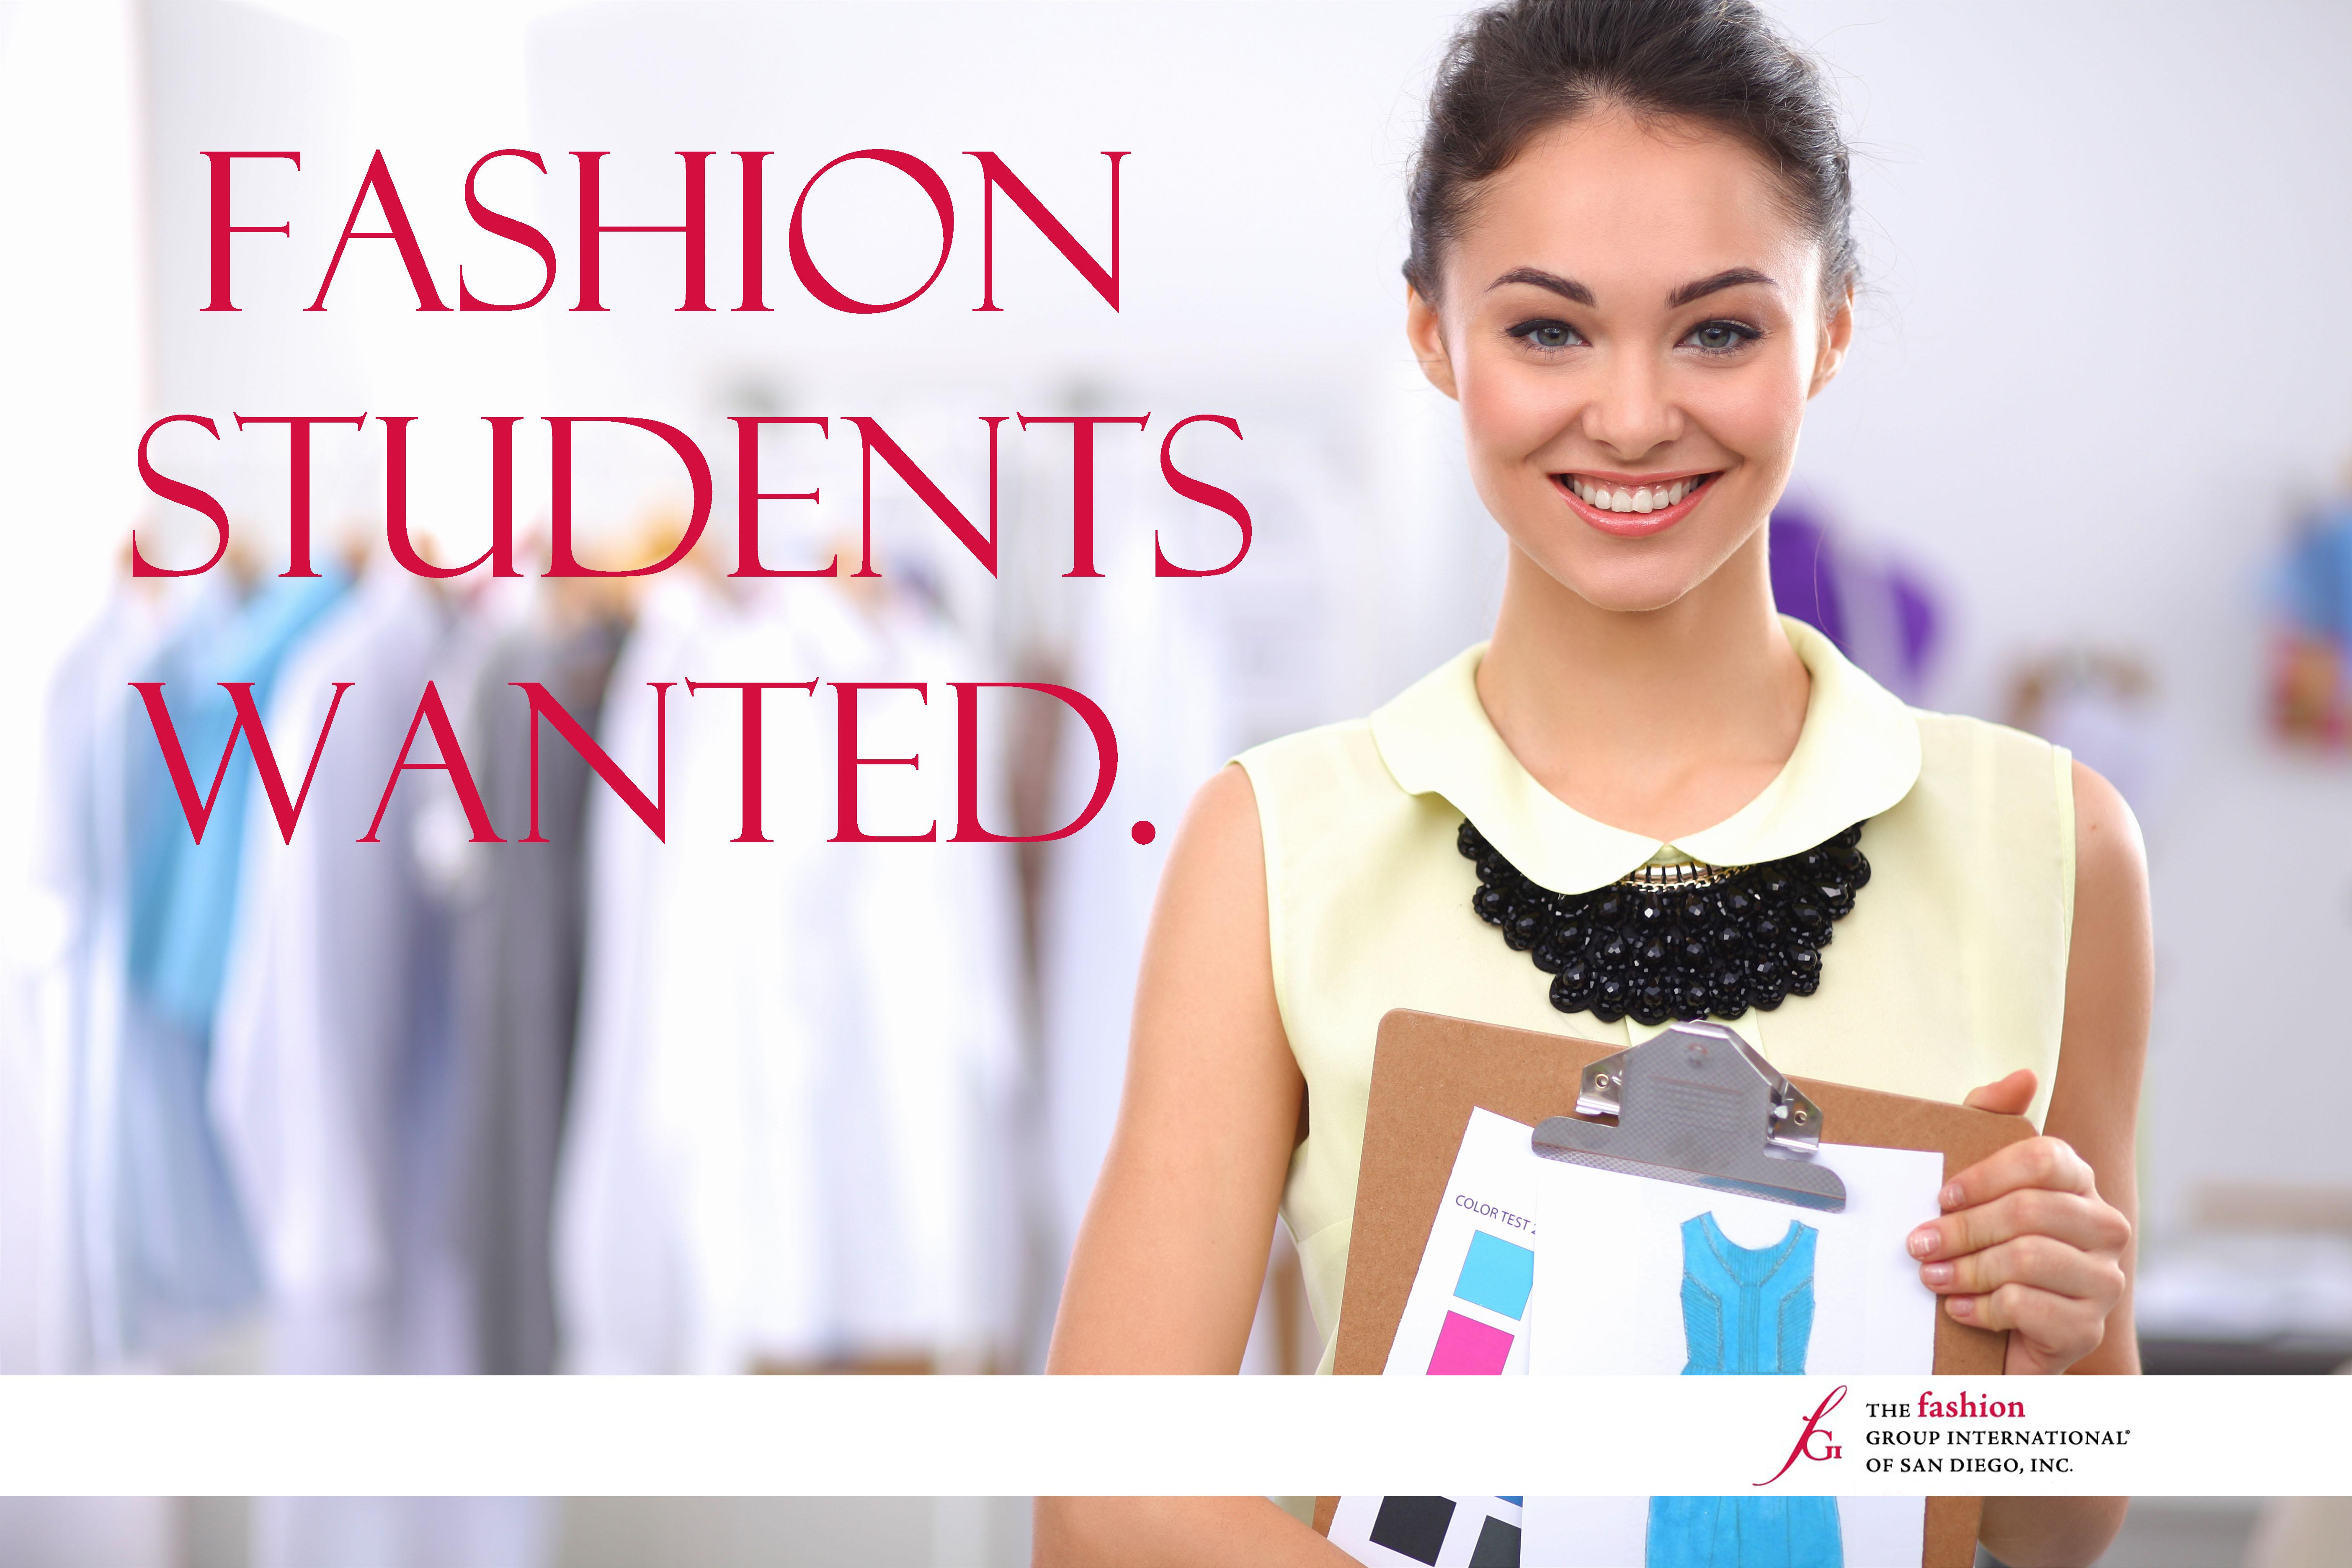 Student Membership Program Fashion Group International Of San Diego